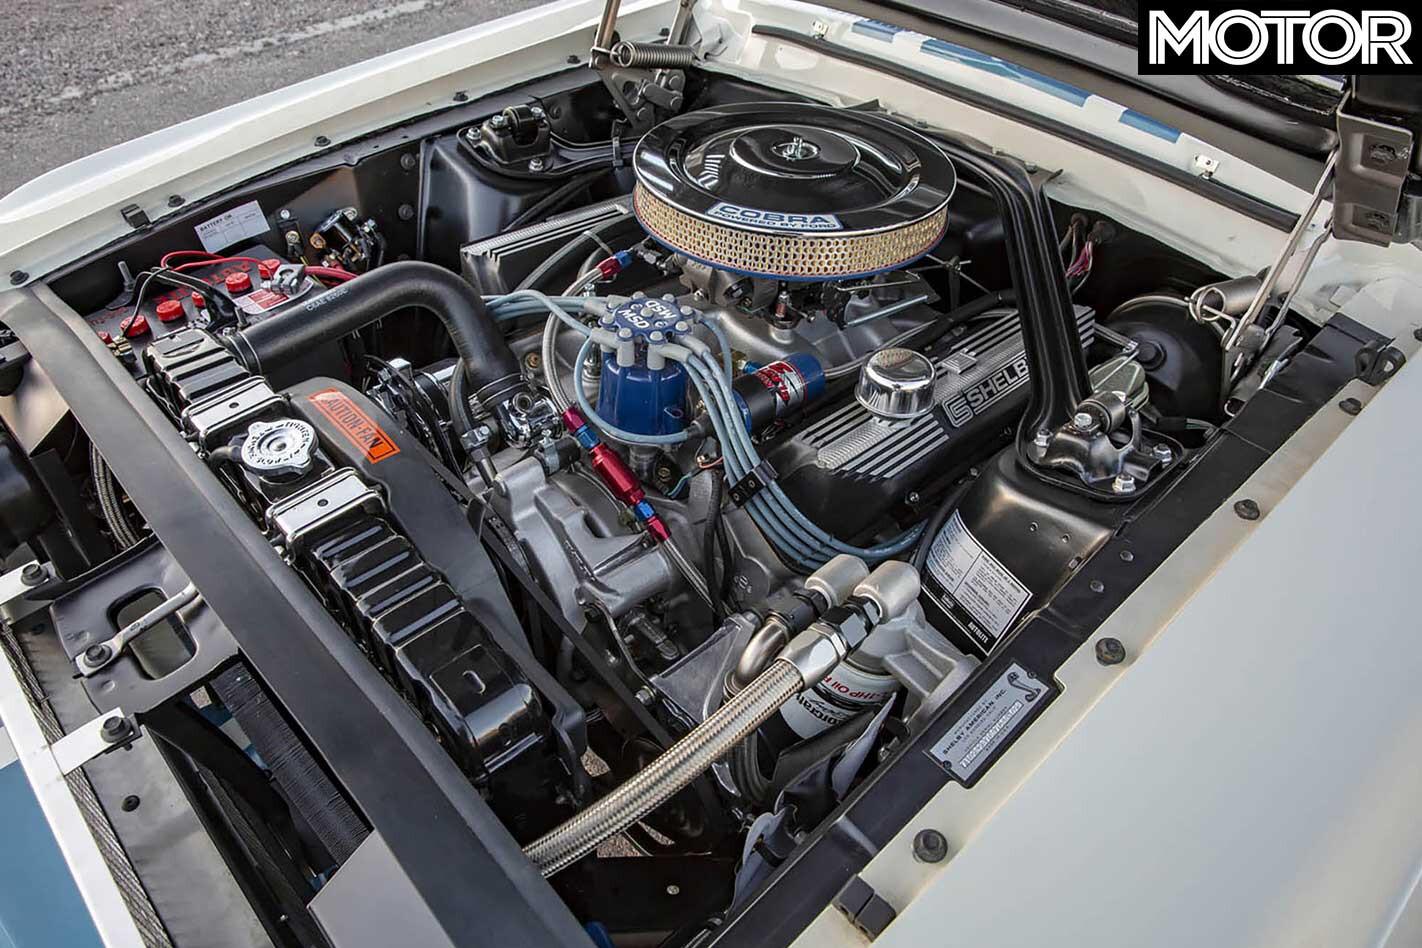 1967 Ford Shelby Gt 500 Super Snake Engine Jpg